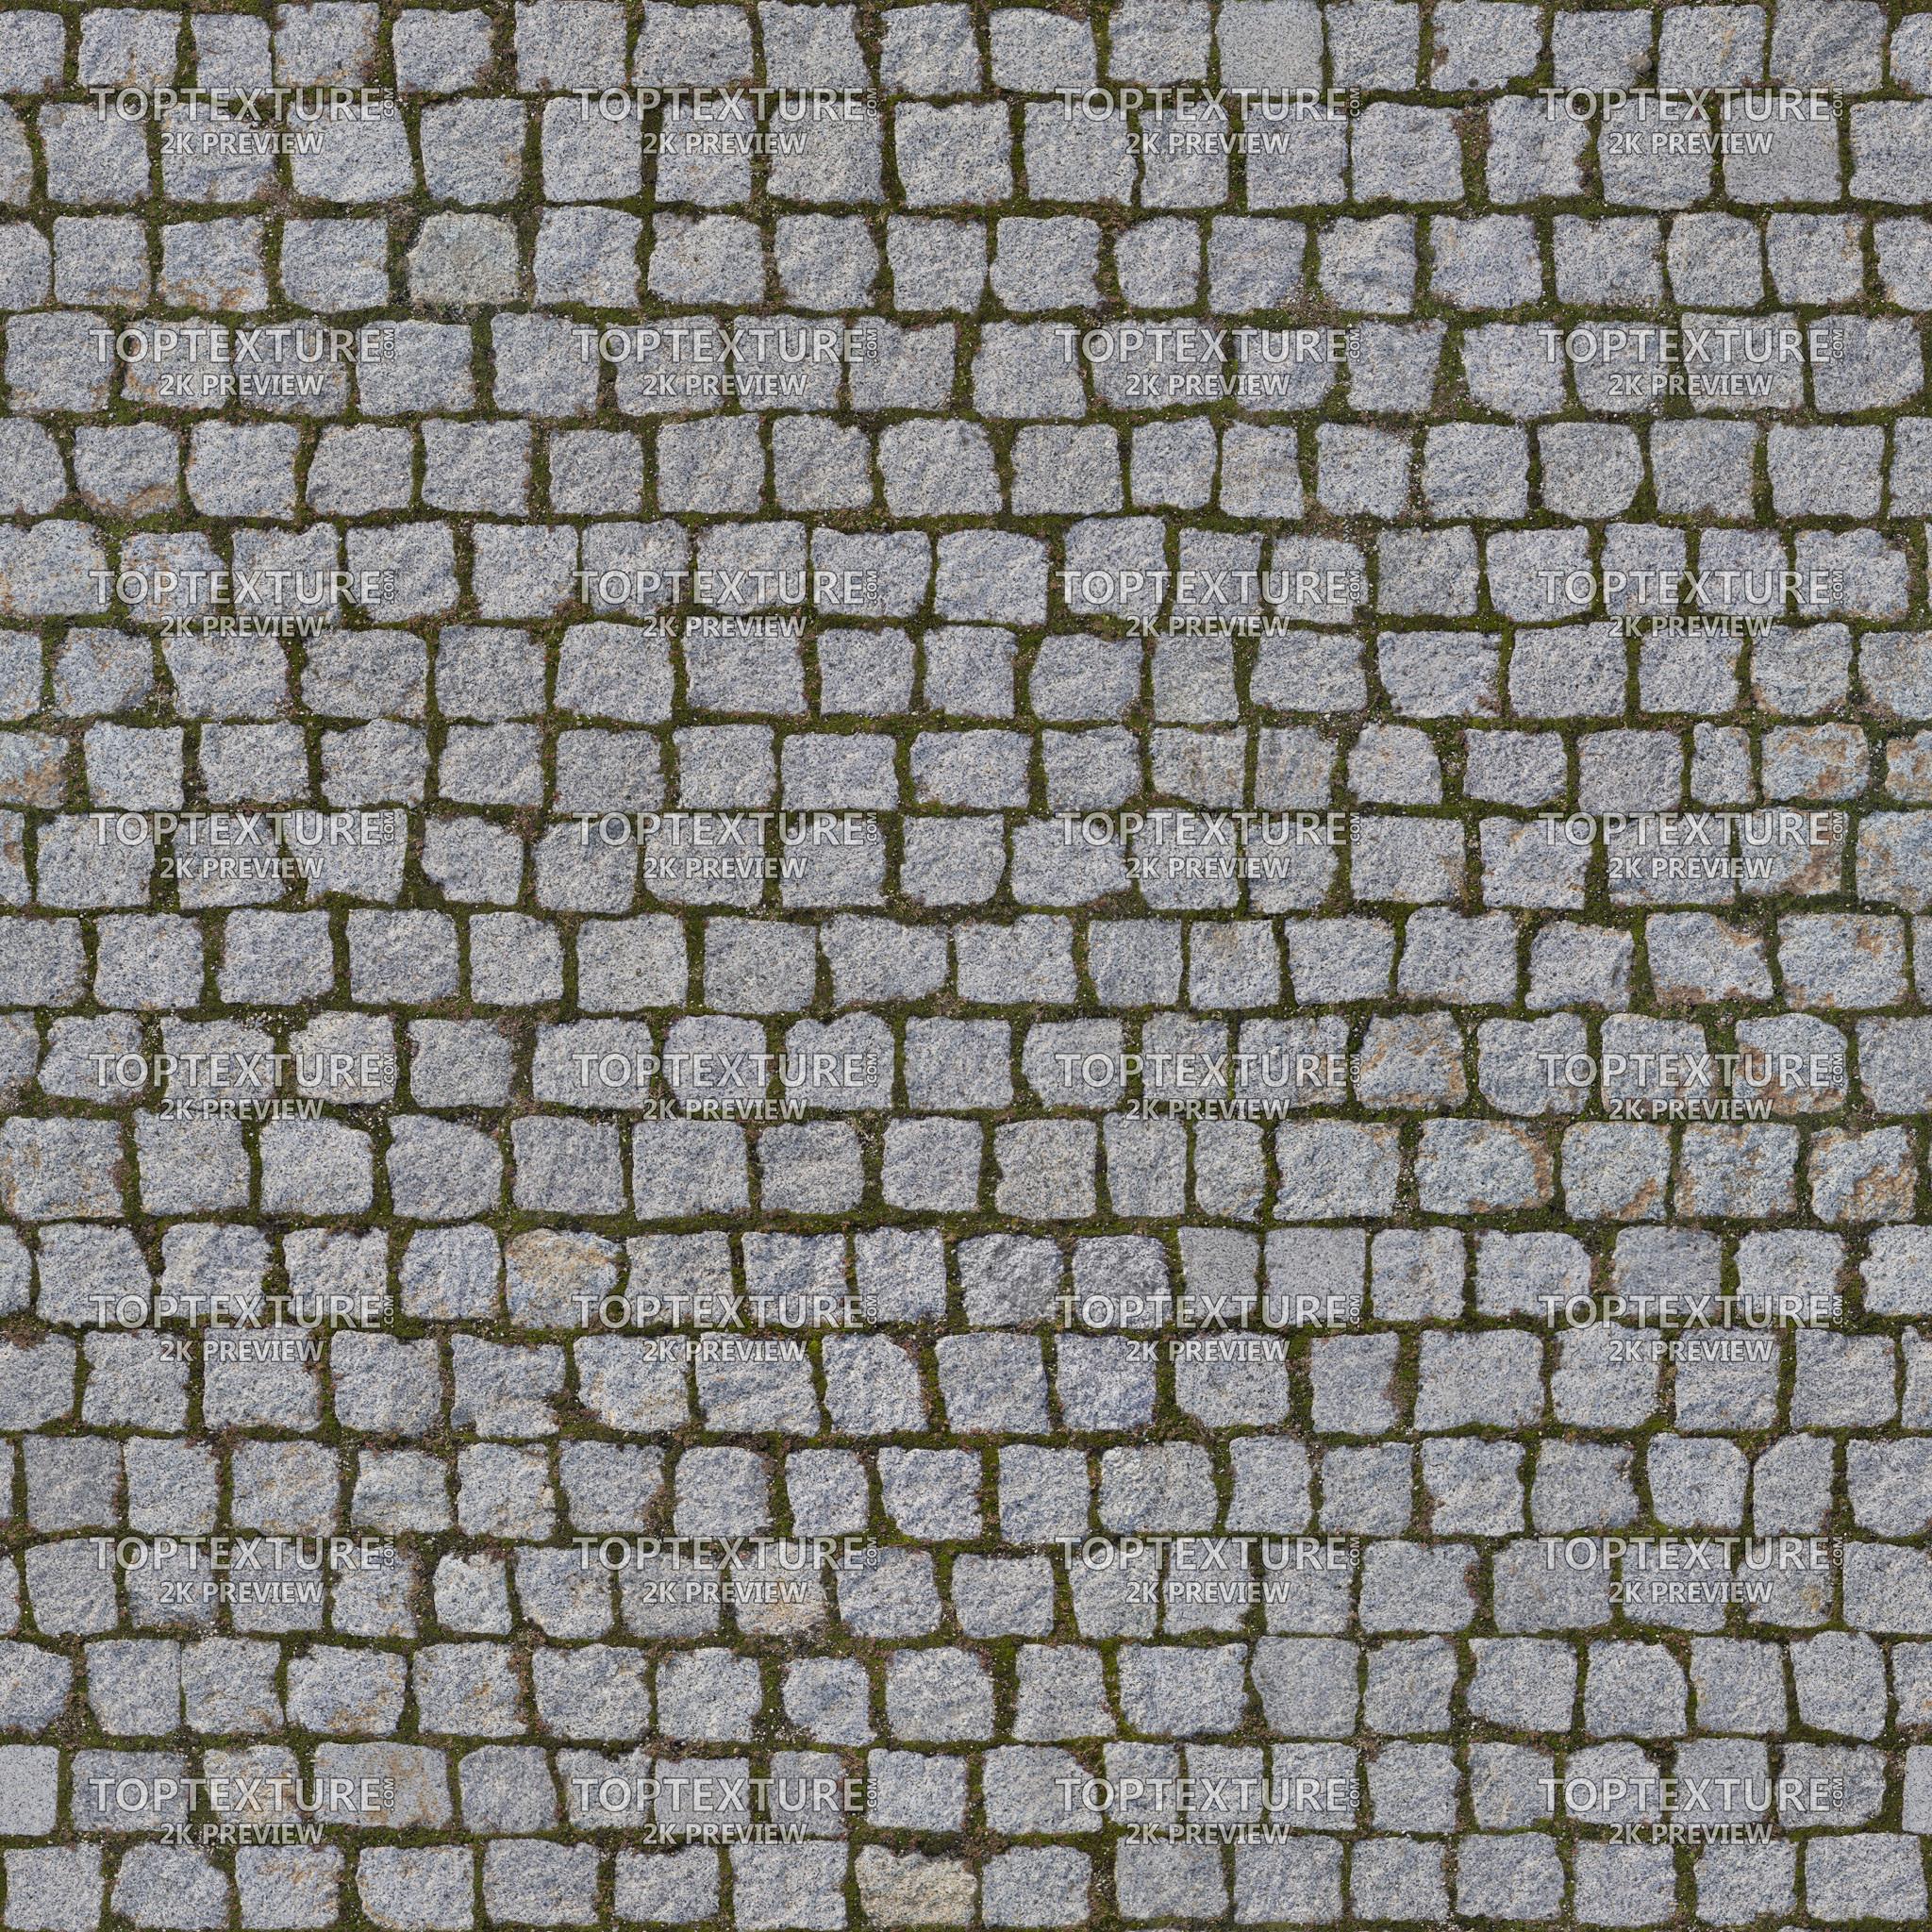 Concrete Cobble Street : Free photo cobbles in pavement rocks setts rock